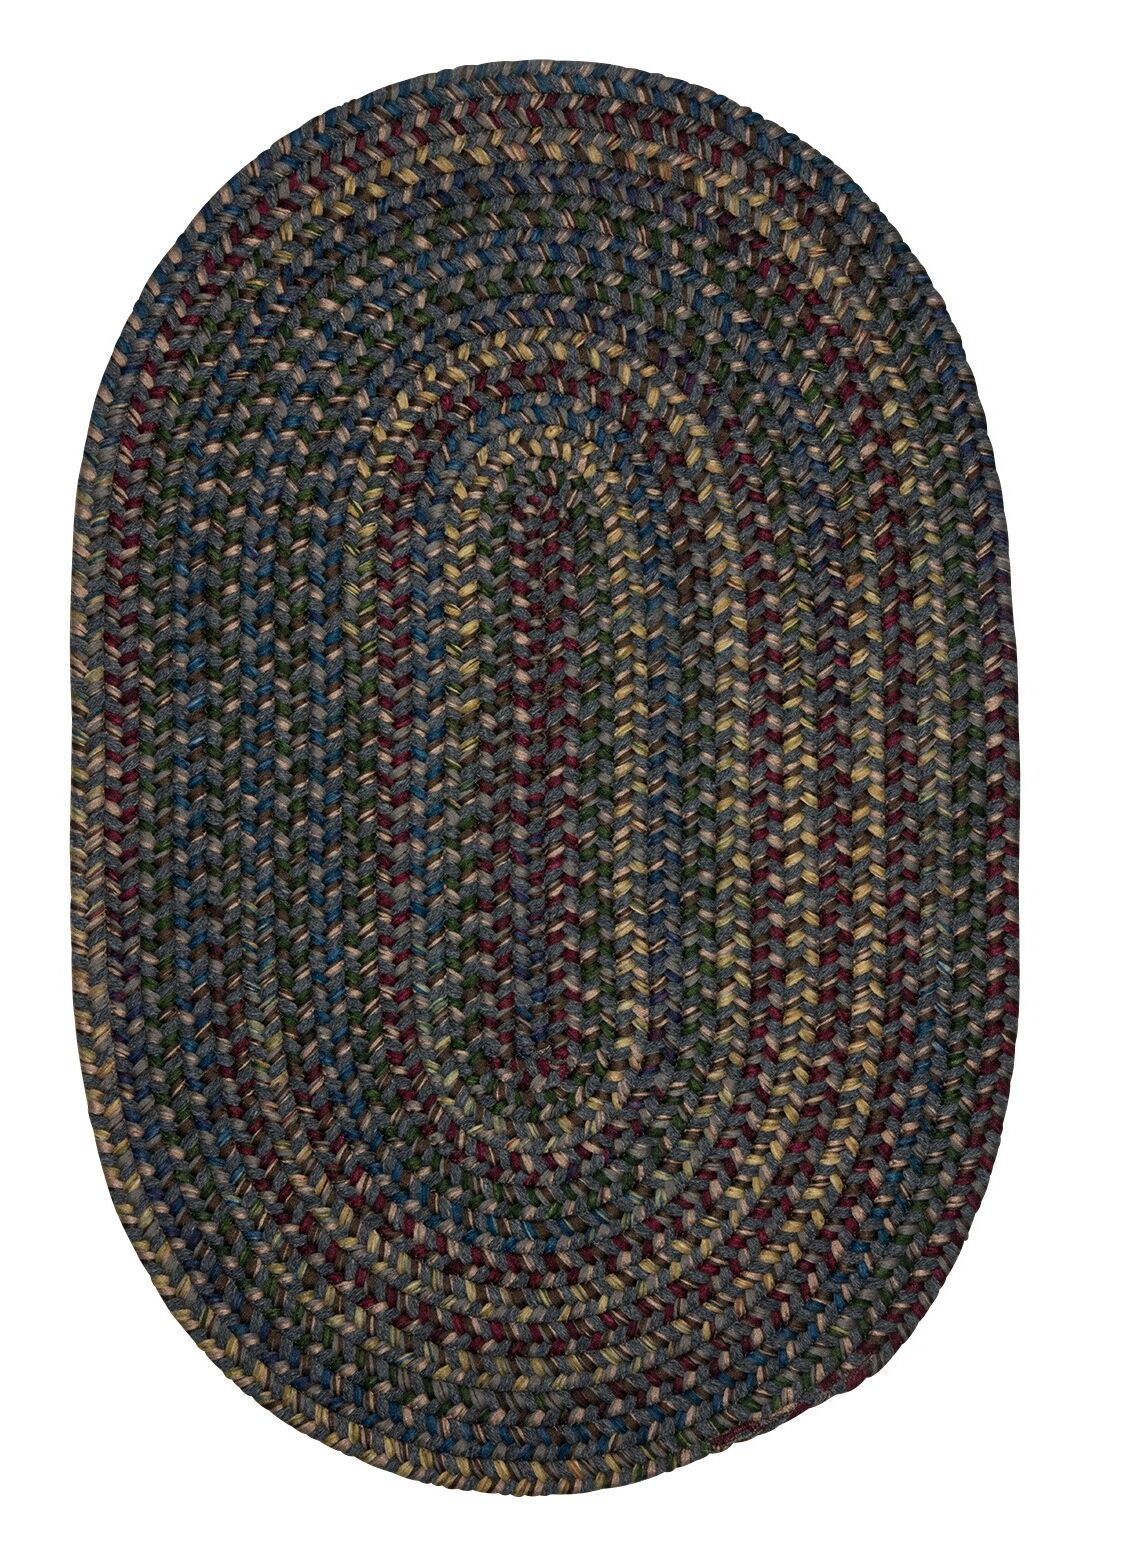 Lippold Charcoal Area Rug Rug Size: Oval 8' x 11'